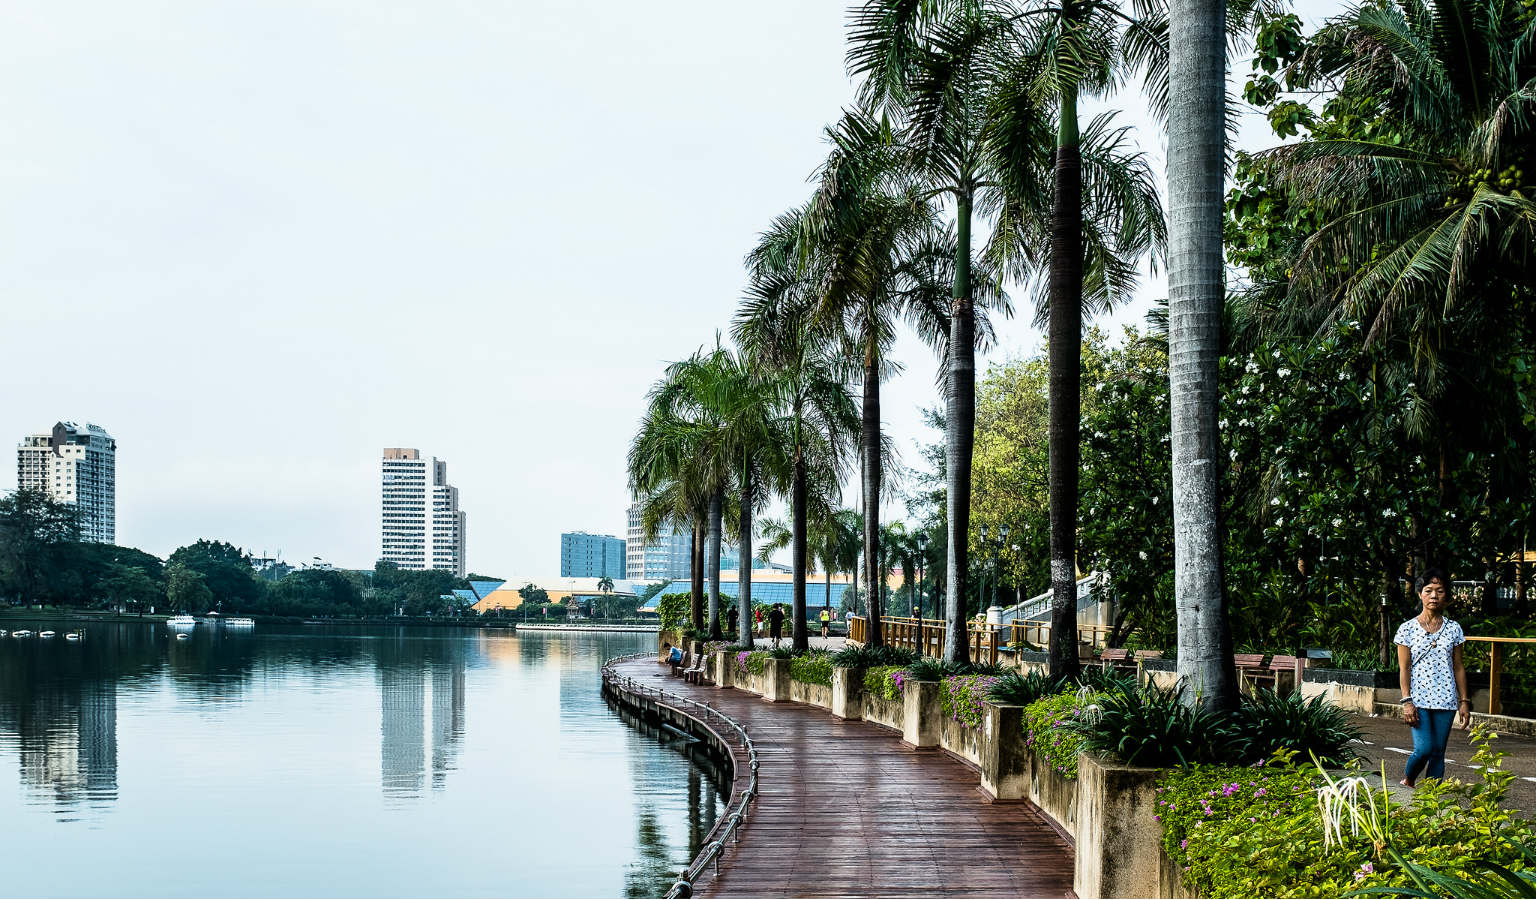 Wandelpad langs het meer van Benjakitti Park in Bangkok